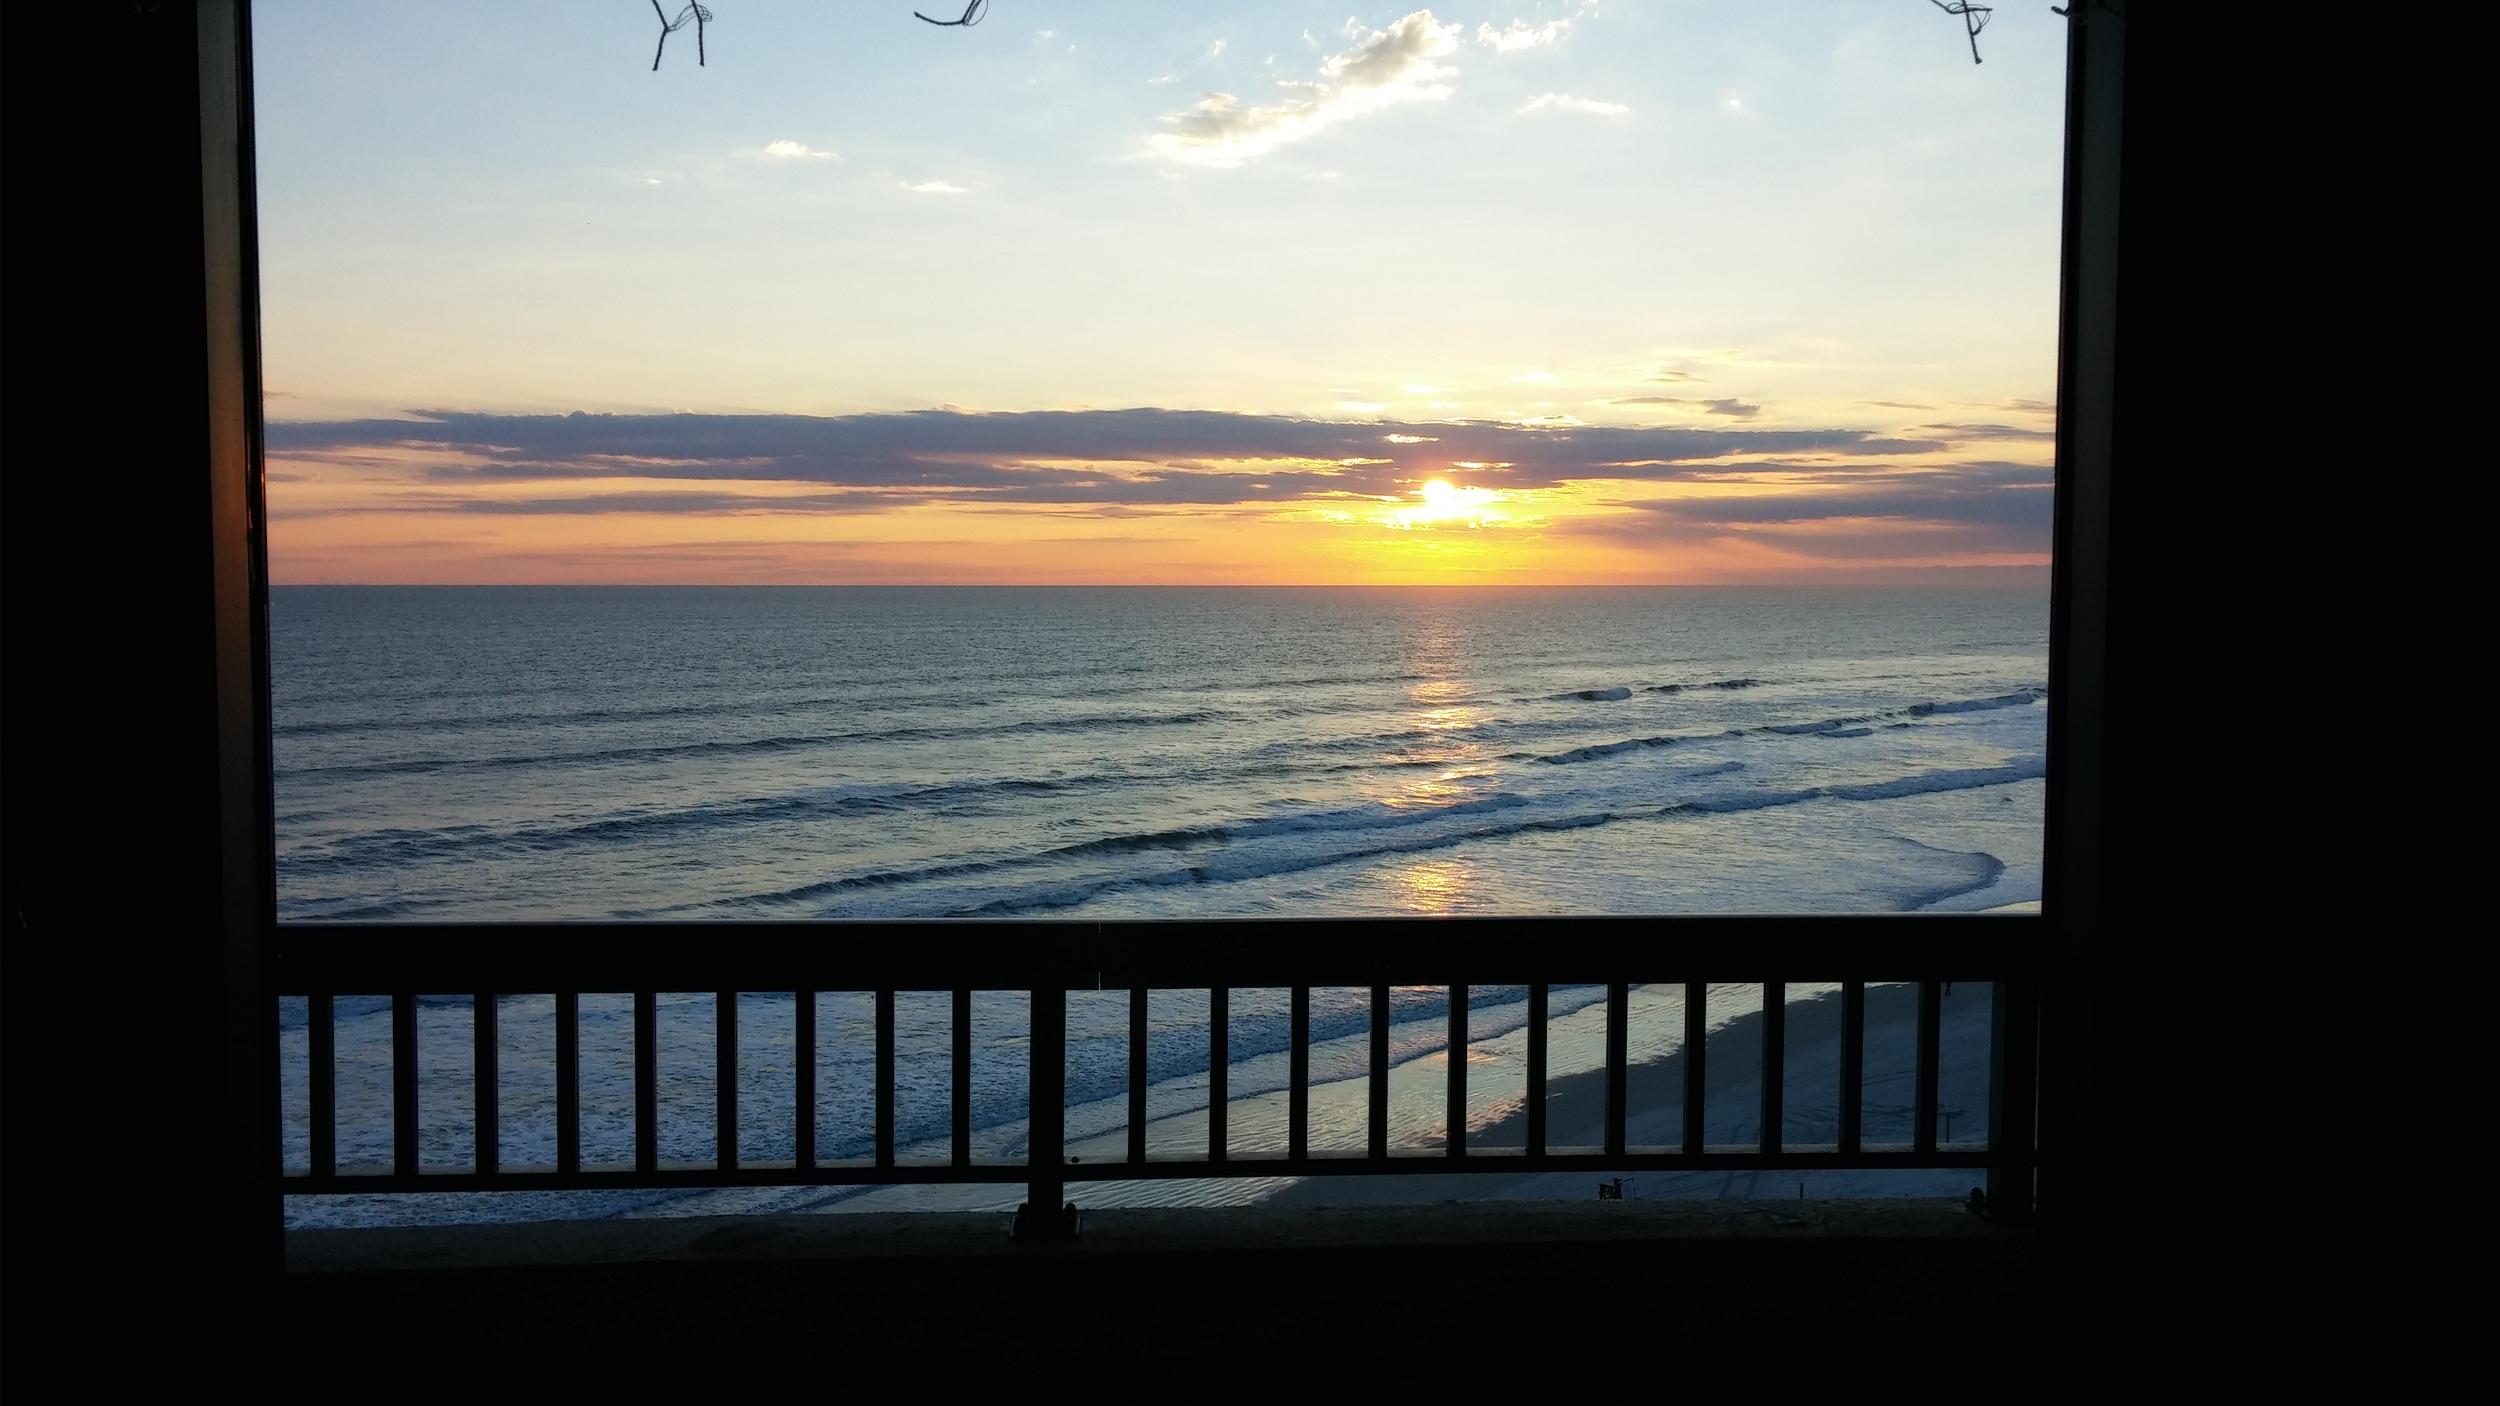 2016-01-11 Best Western New Smyrna Beach FL 9.jpg